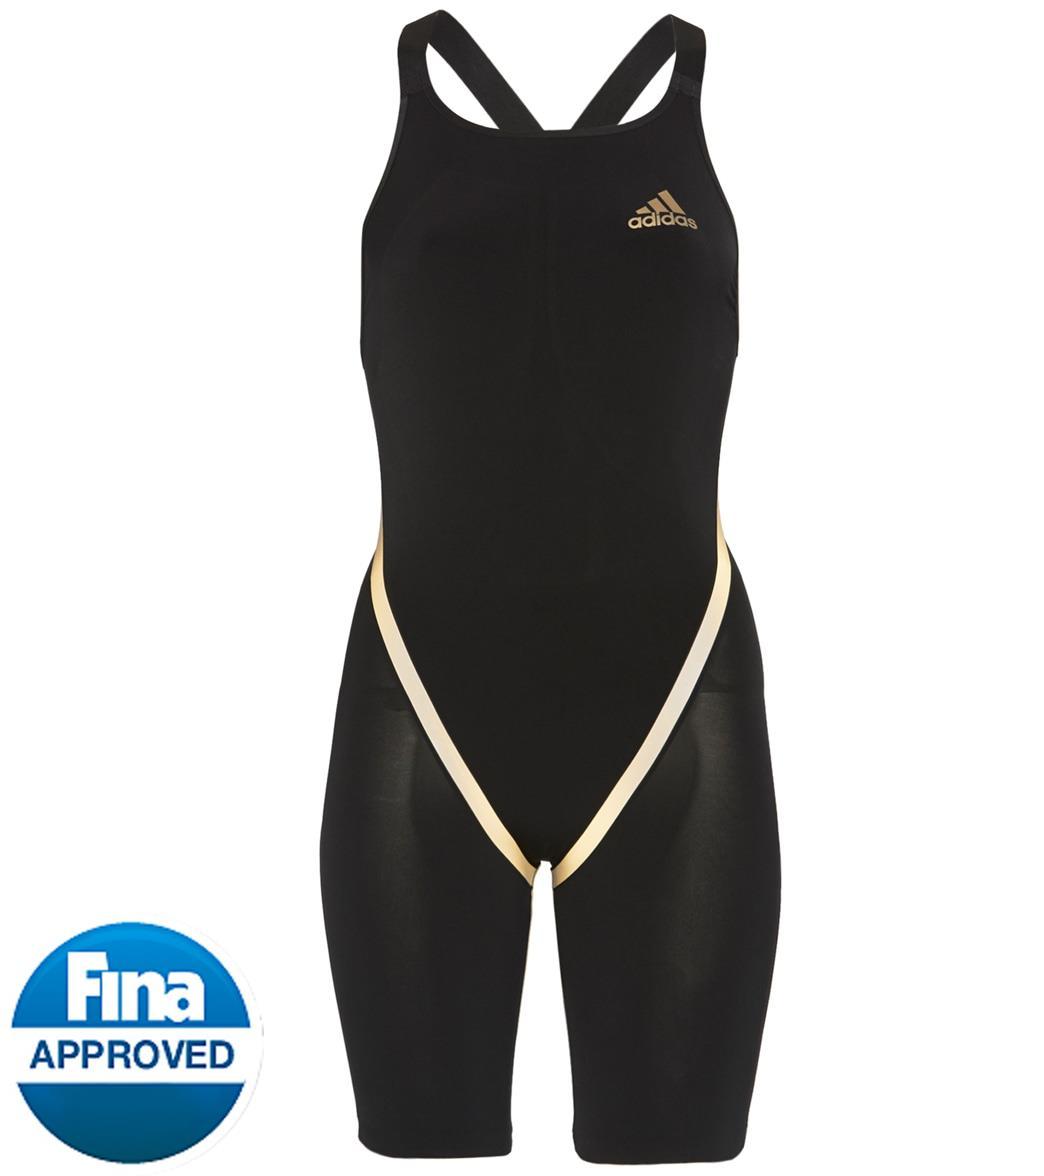 Adidas Women's Adizero Freestyle Open Back Tech Suit Swimsuit